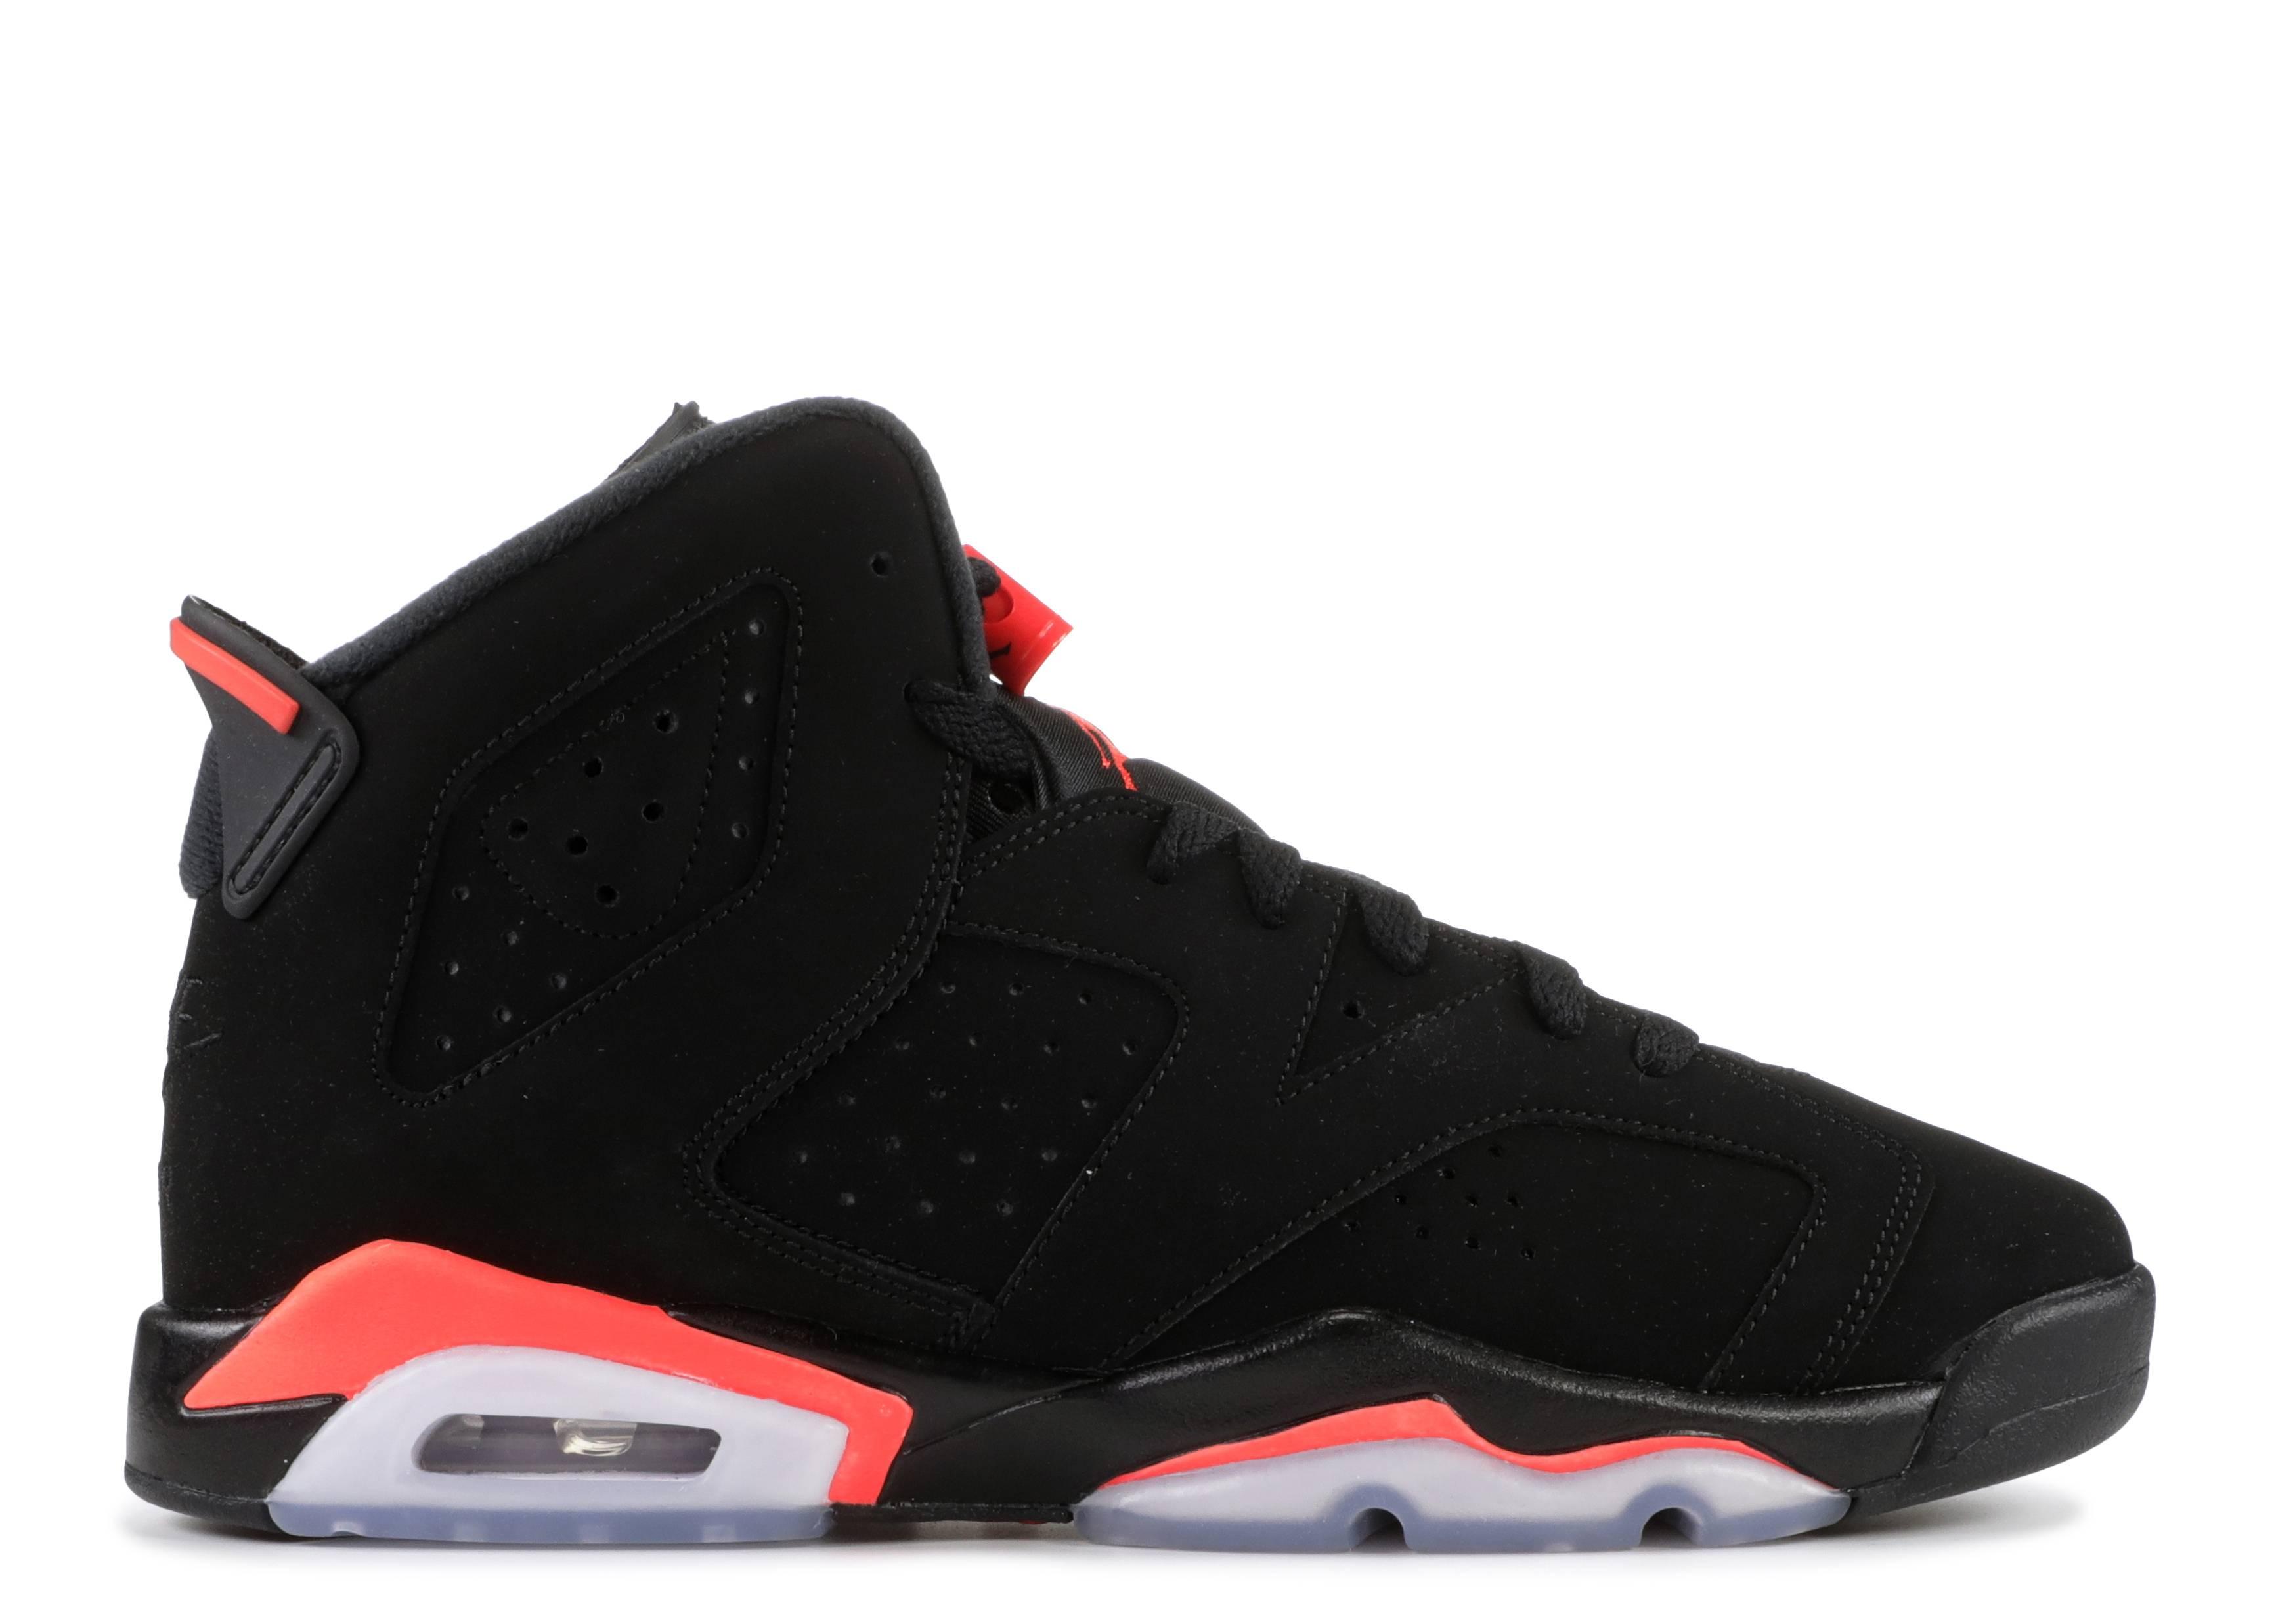 preview of online here new cheap Air Jordan 6 (VI) Shoes - Nike | Flight Club